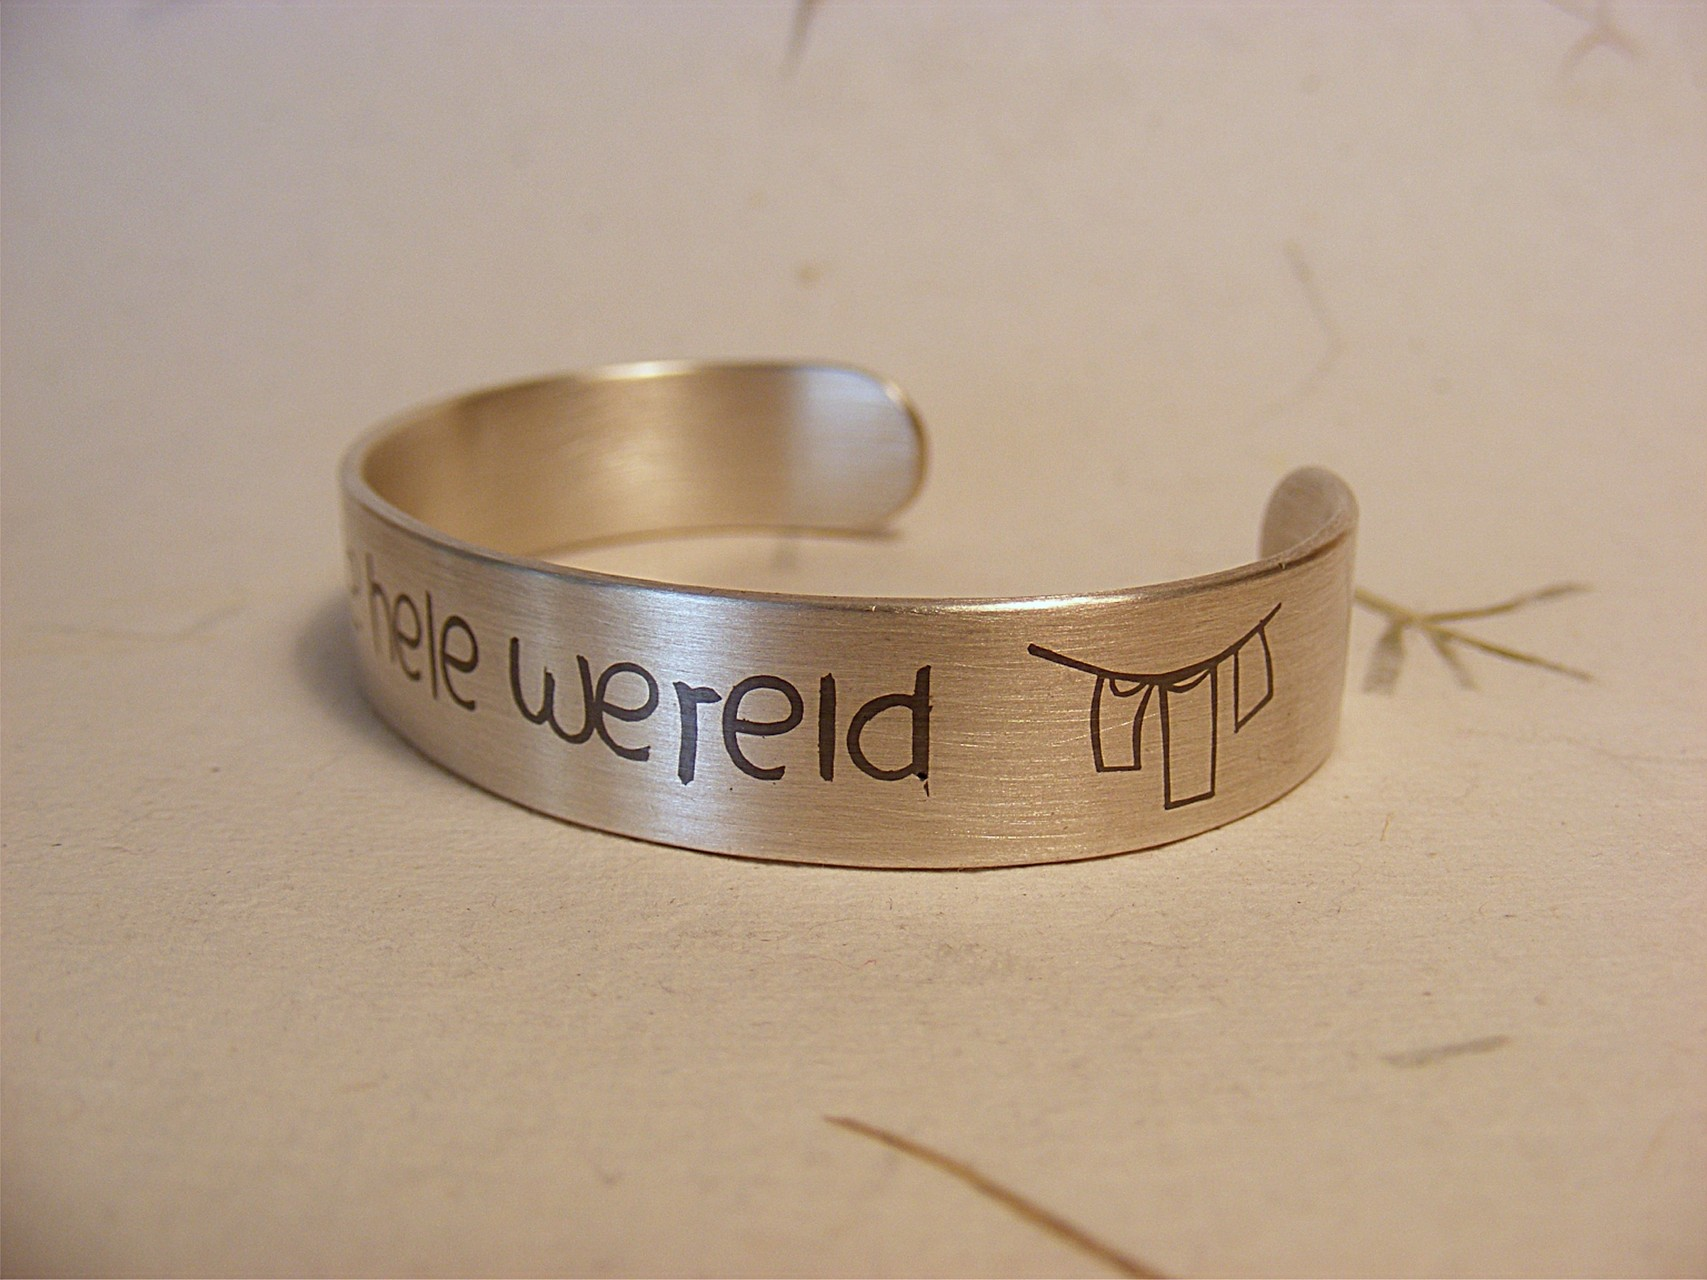 armband, zilver en niëllo